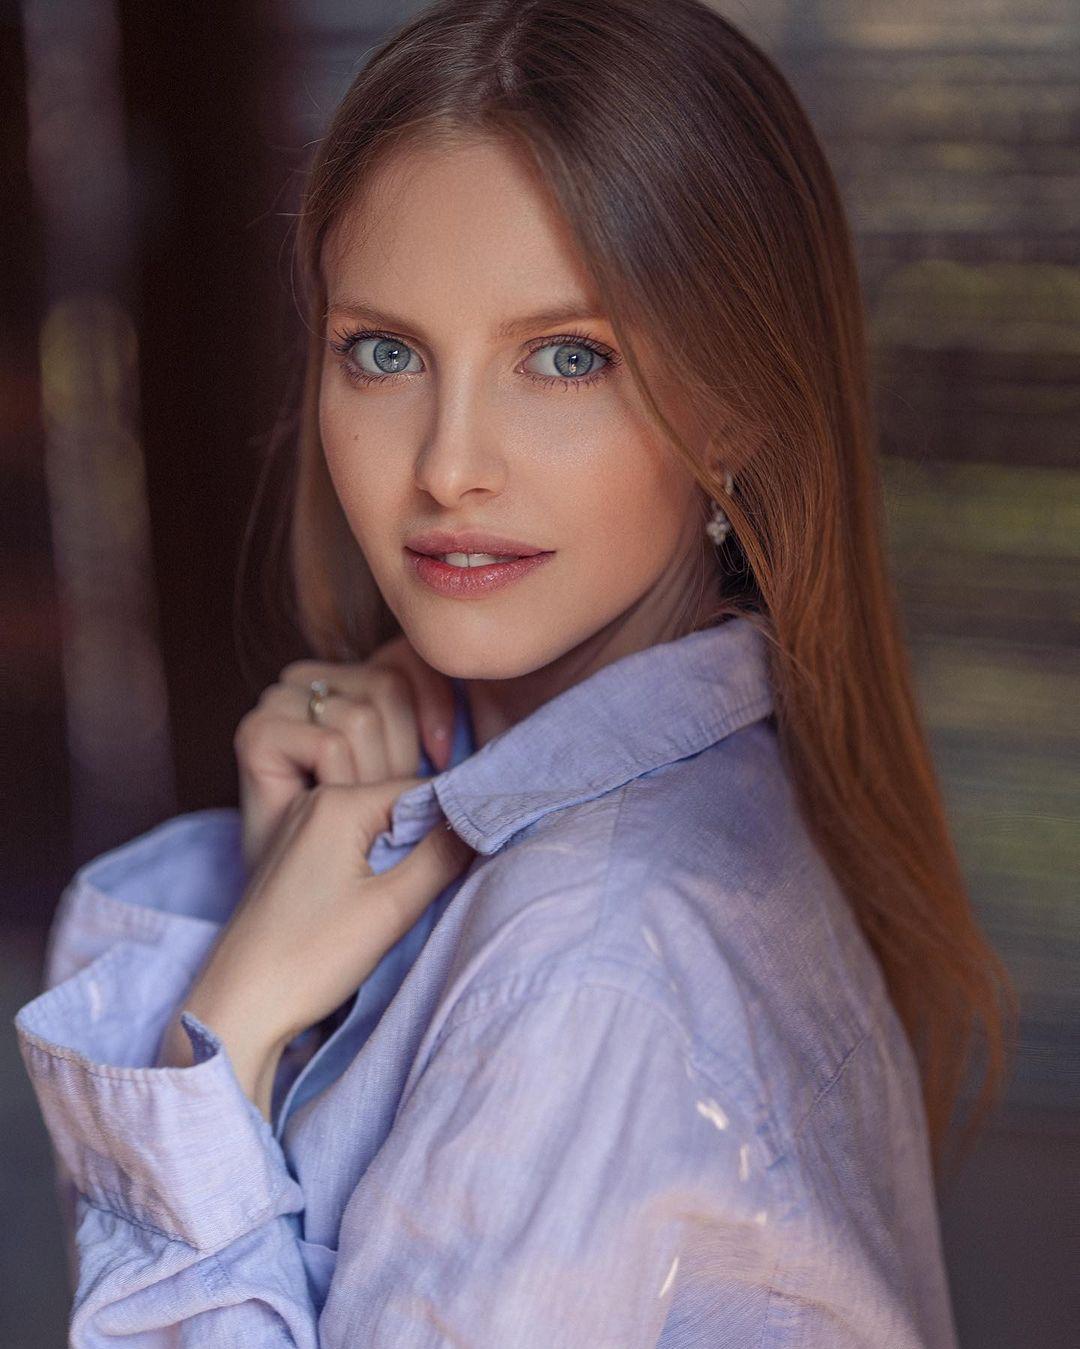 Nicole-marie-j-Wallpapers-Insta-Fit-Bio-6